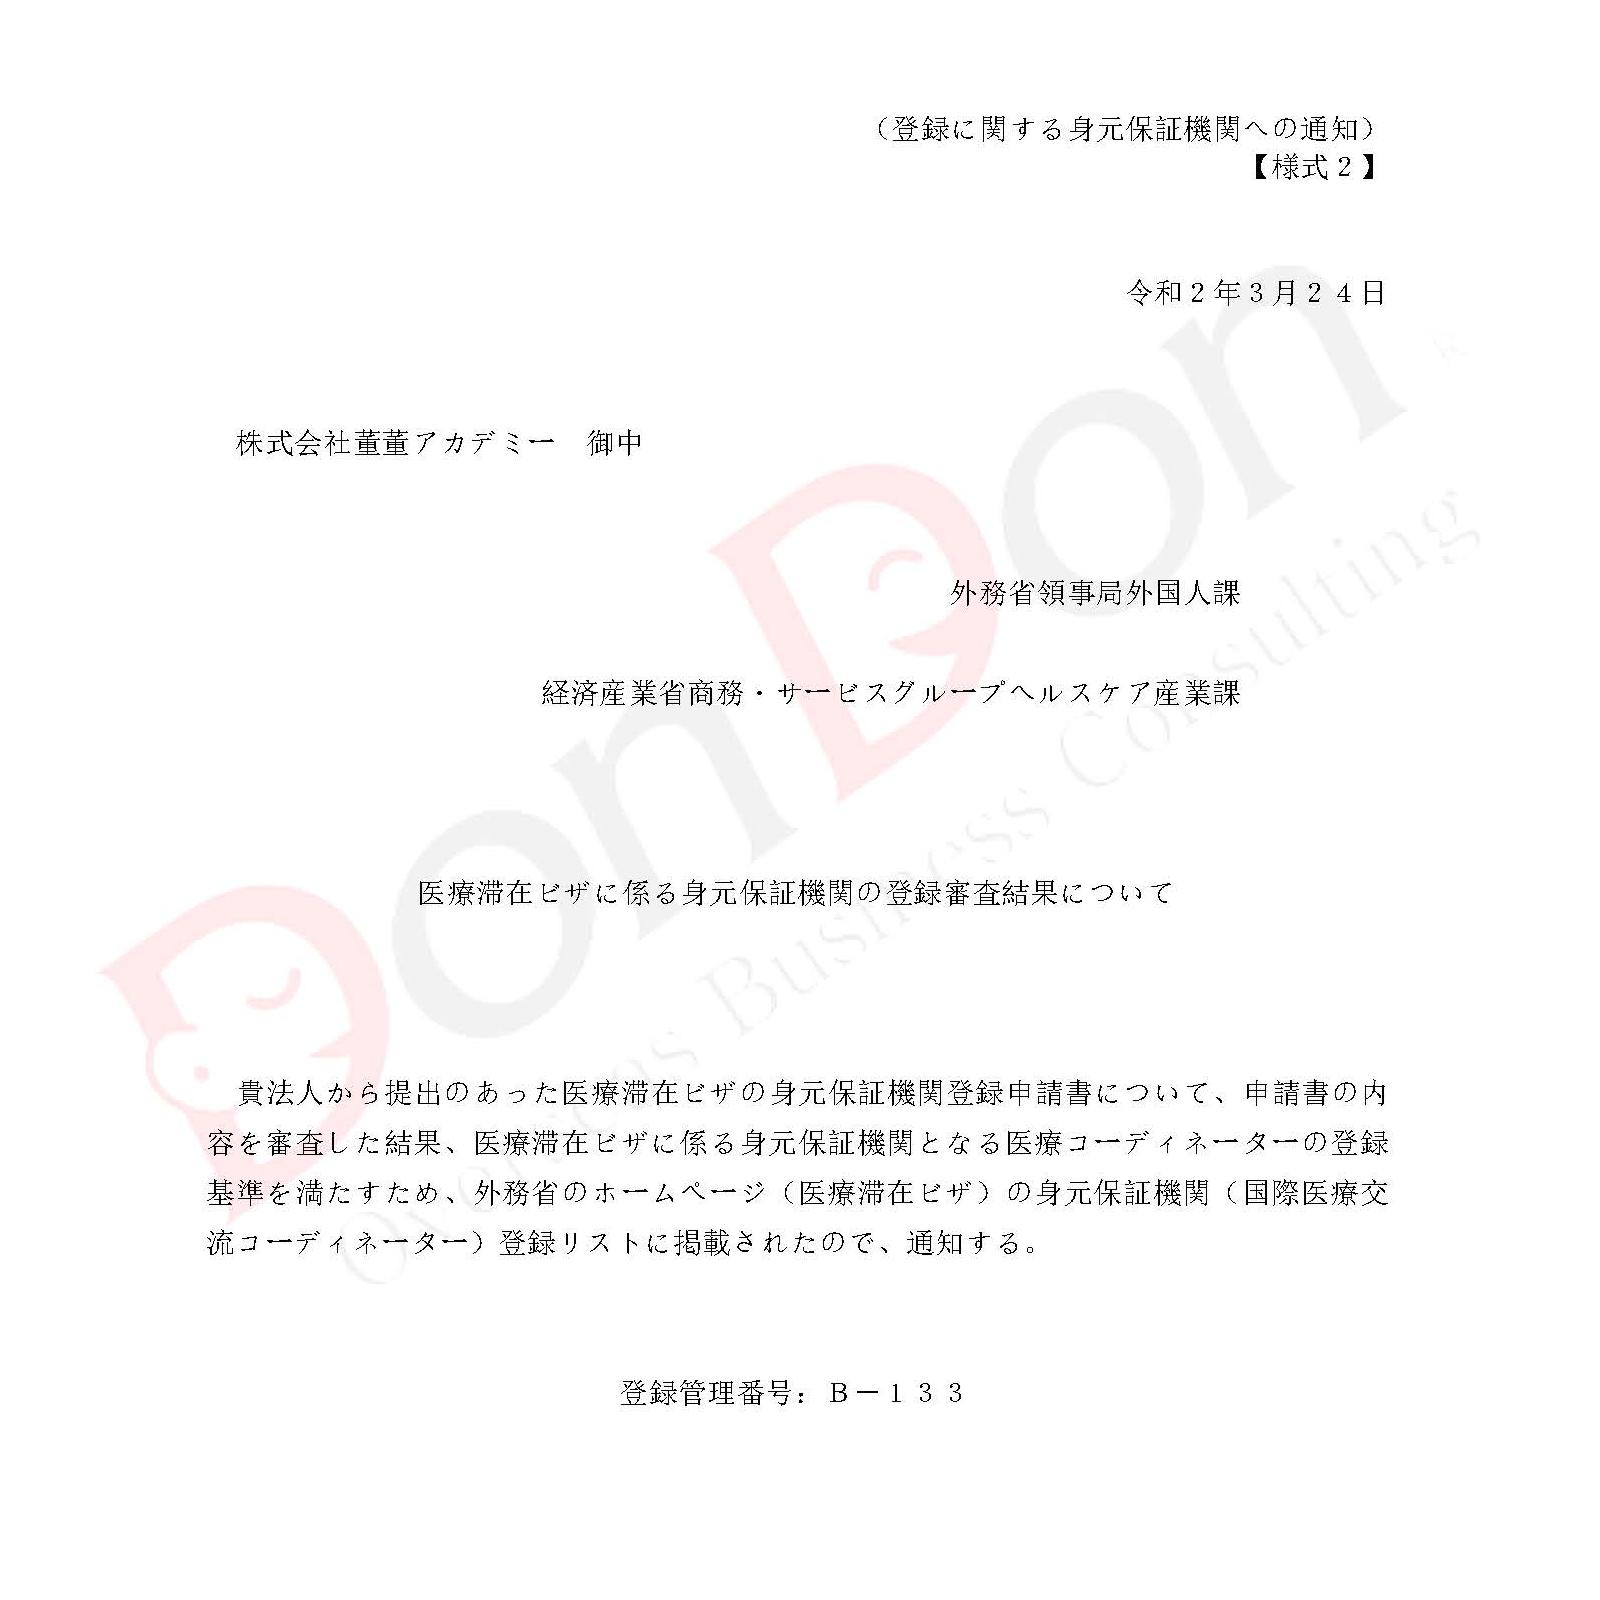 身元保証機関の登録通知-133.株式会社董董アカデミー